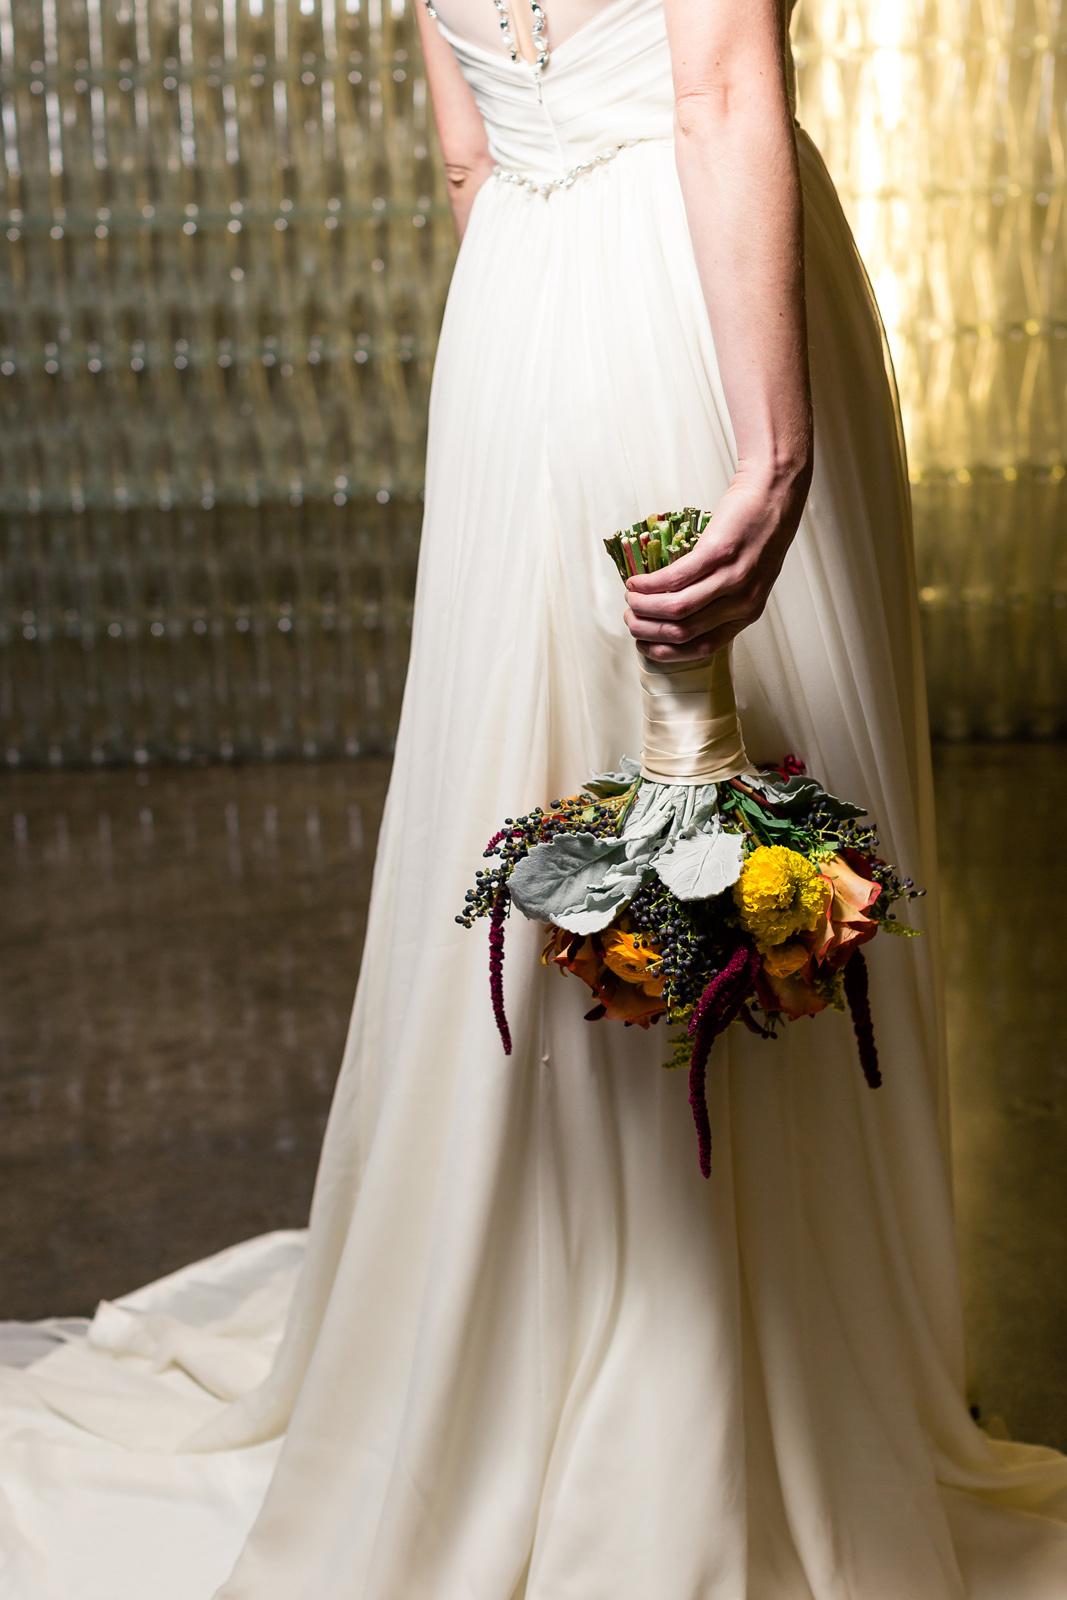 Oldani Photography-St Louis-Wedding Photos-wedding photographer-wedding party-City Museum_20141122_17091290.jpg